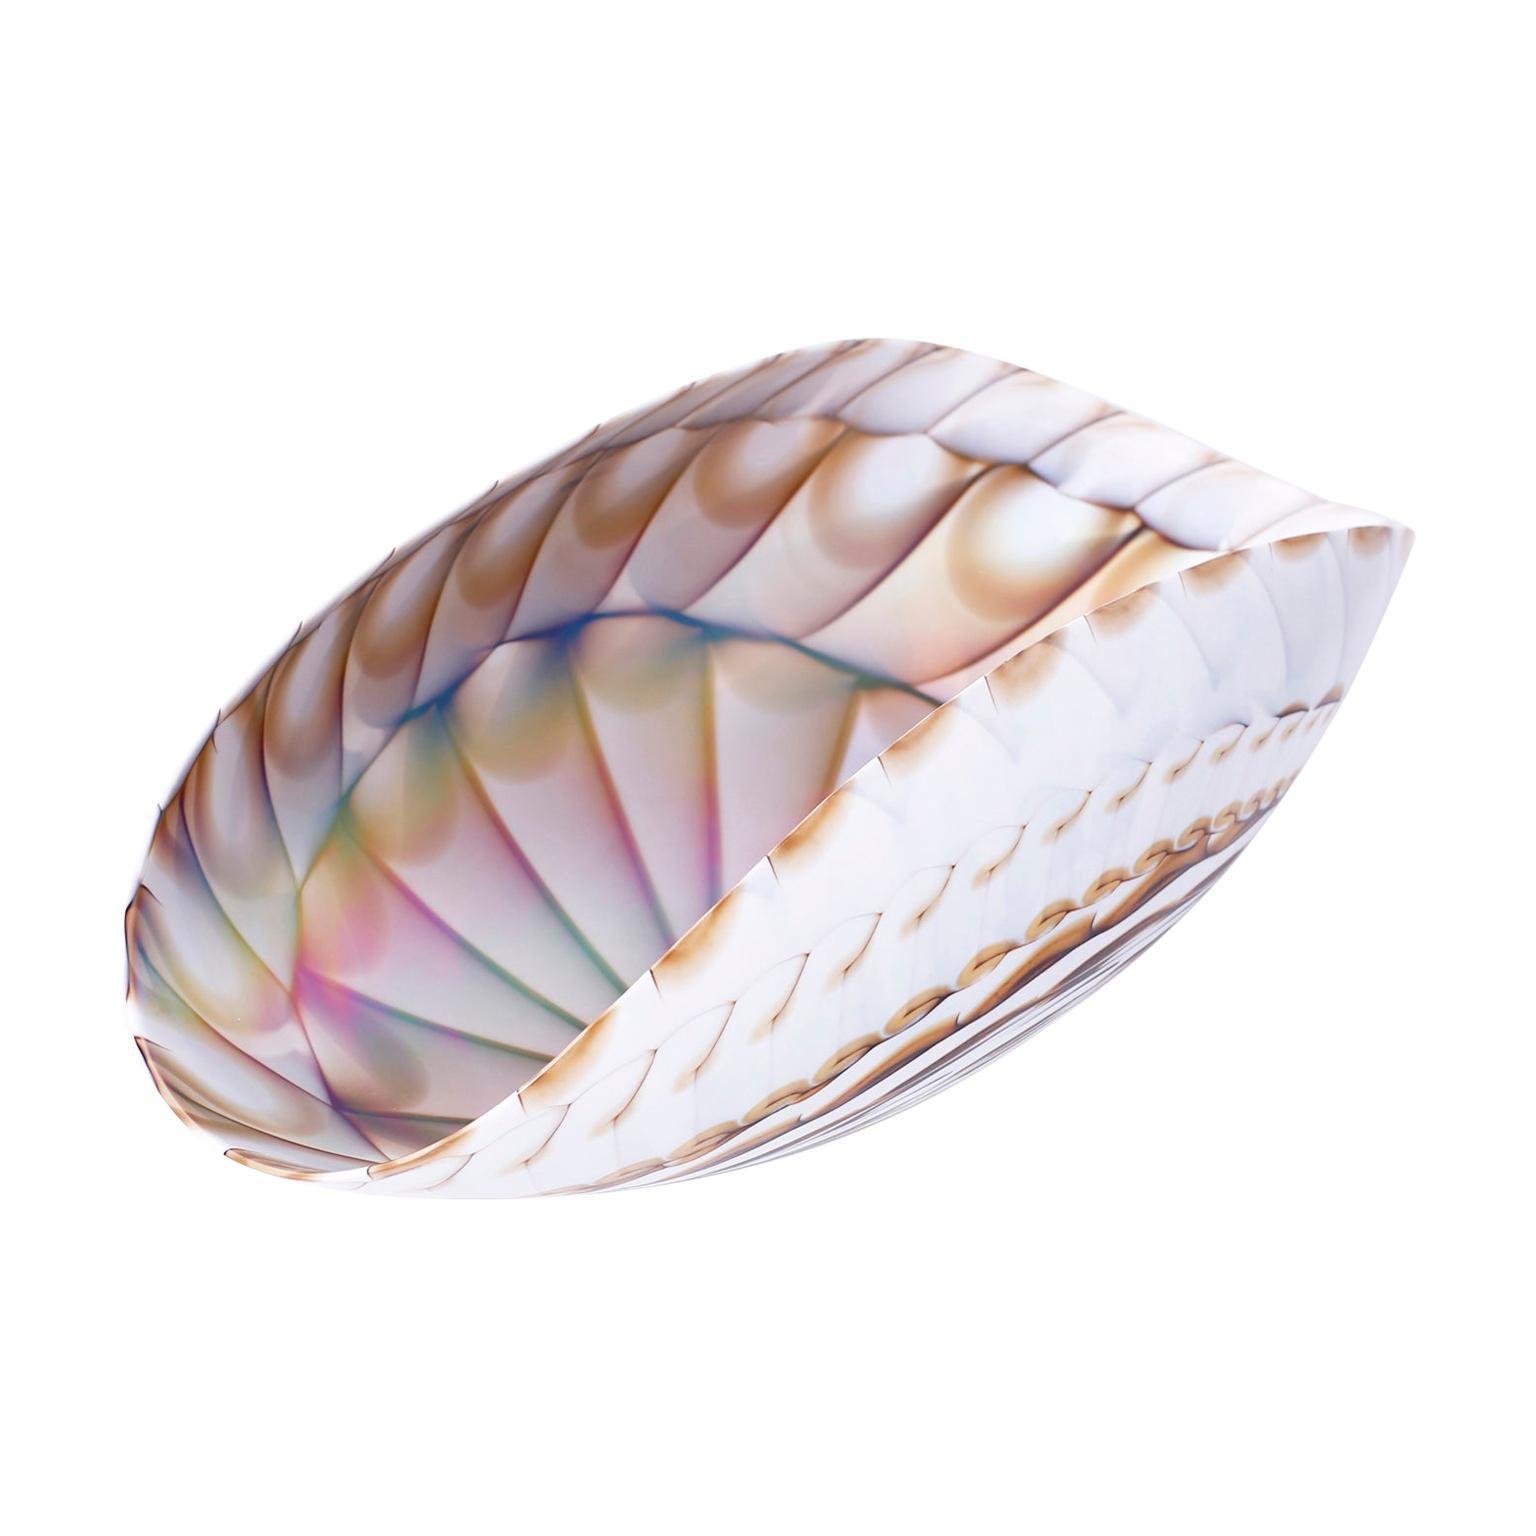 Midcentury Murano Glass Sea Shell Bowl by Furnace Ferro